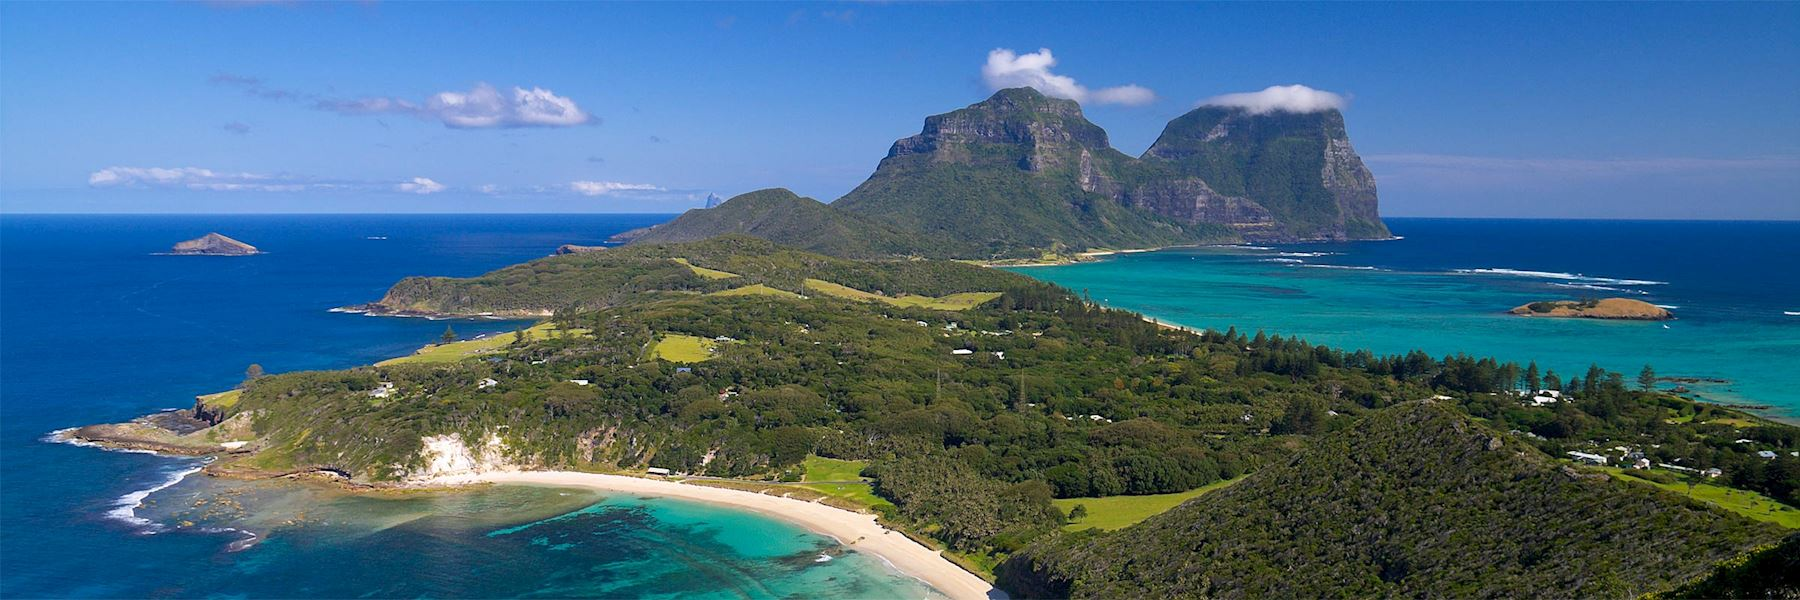 Australia Best Time To Travel